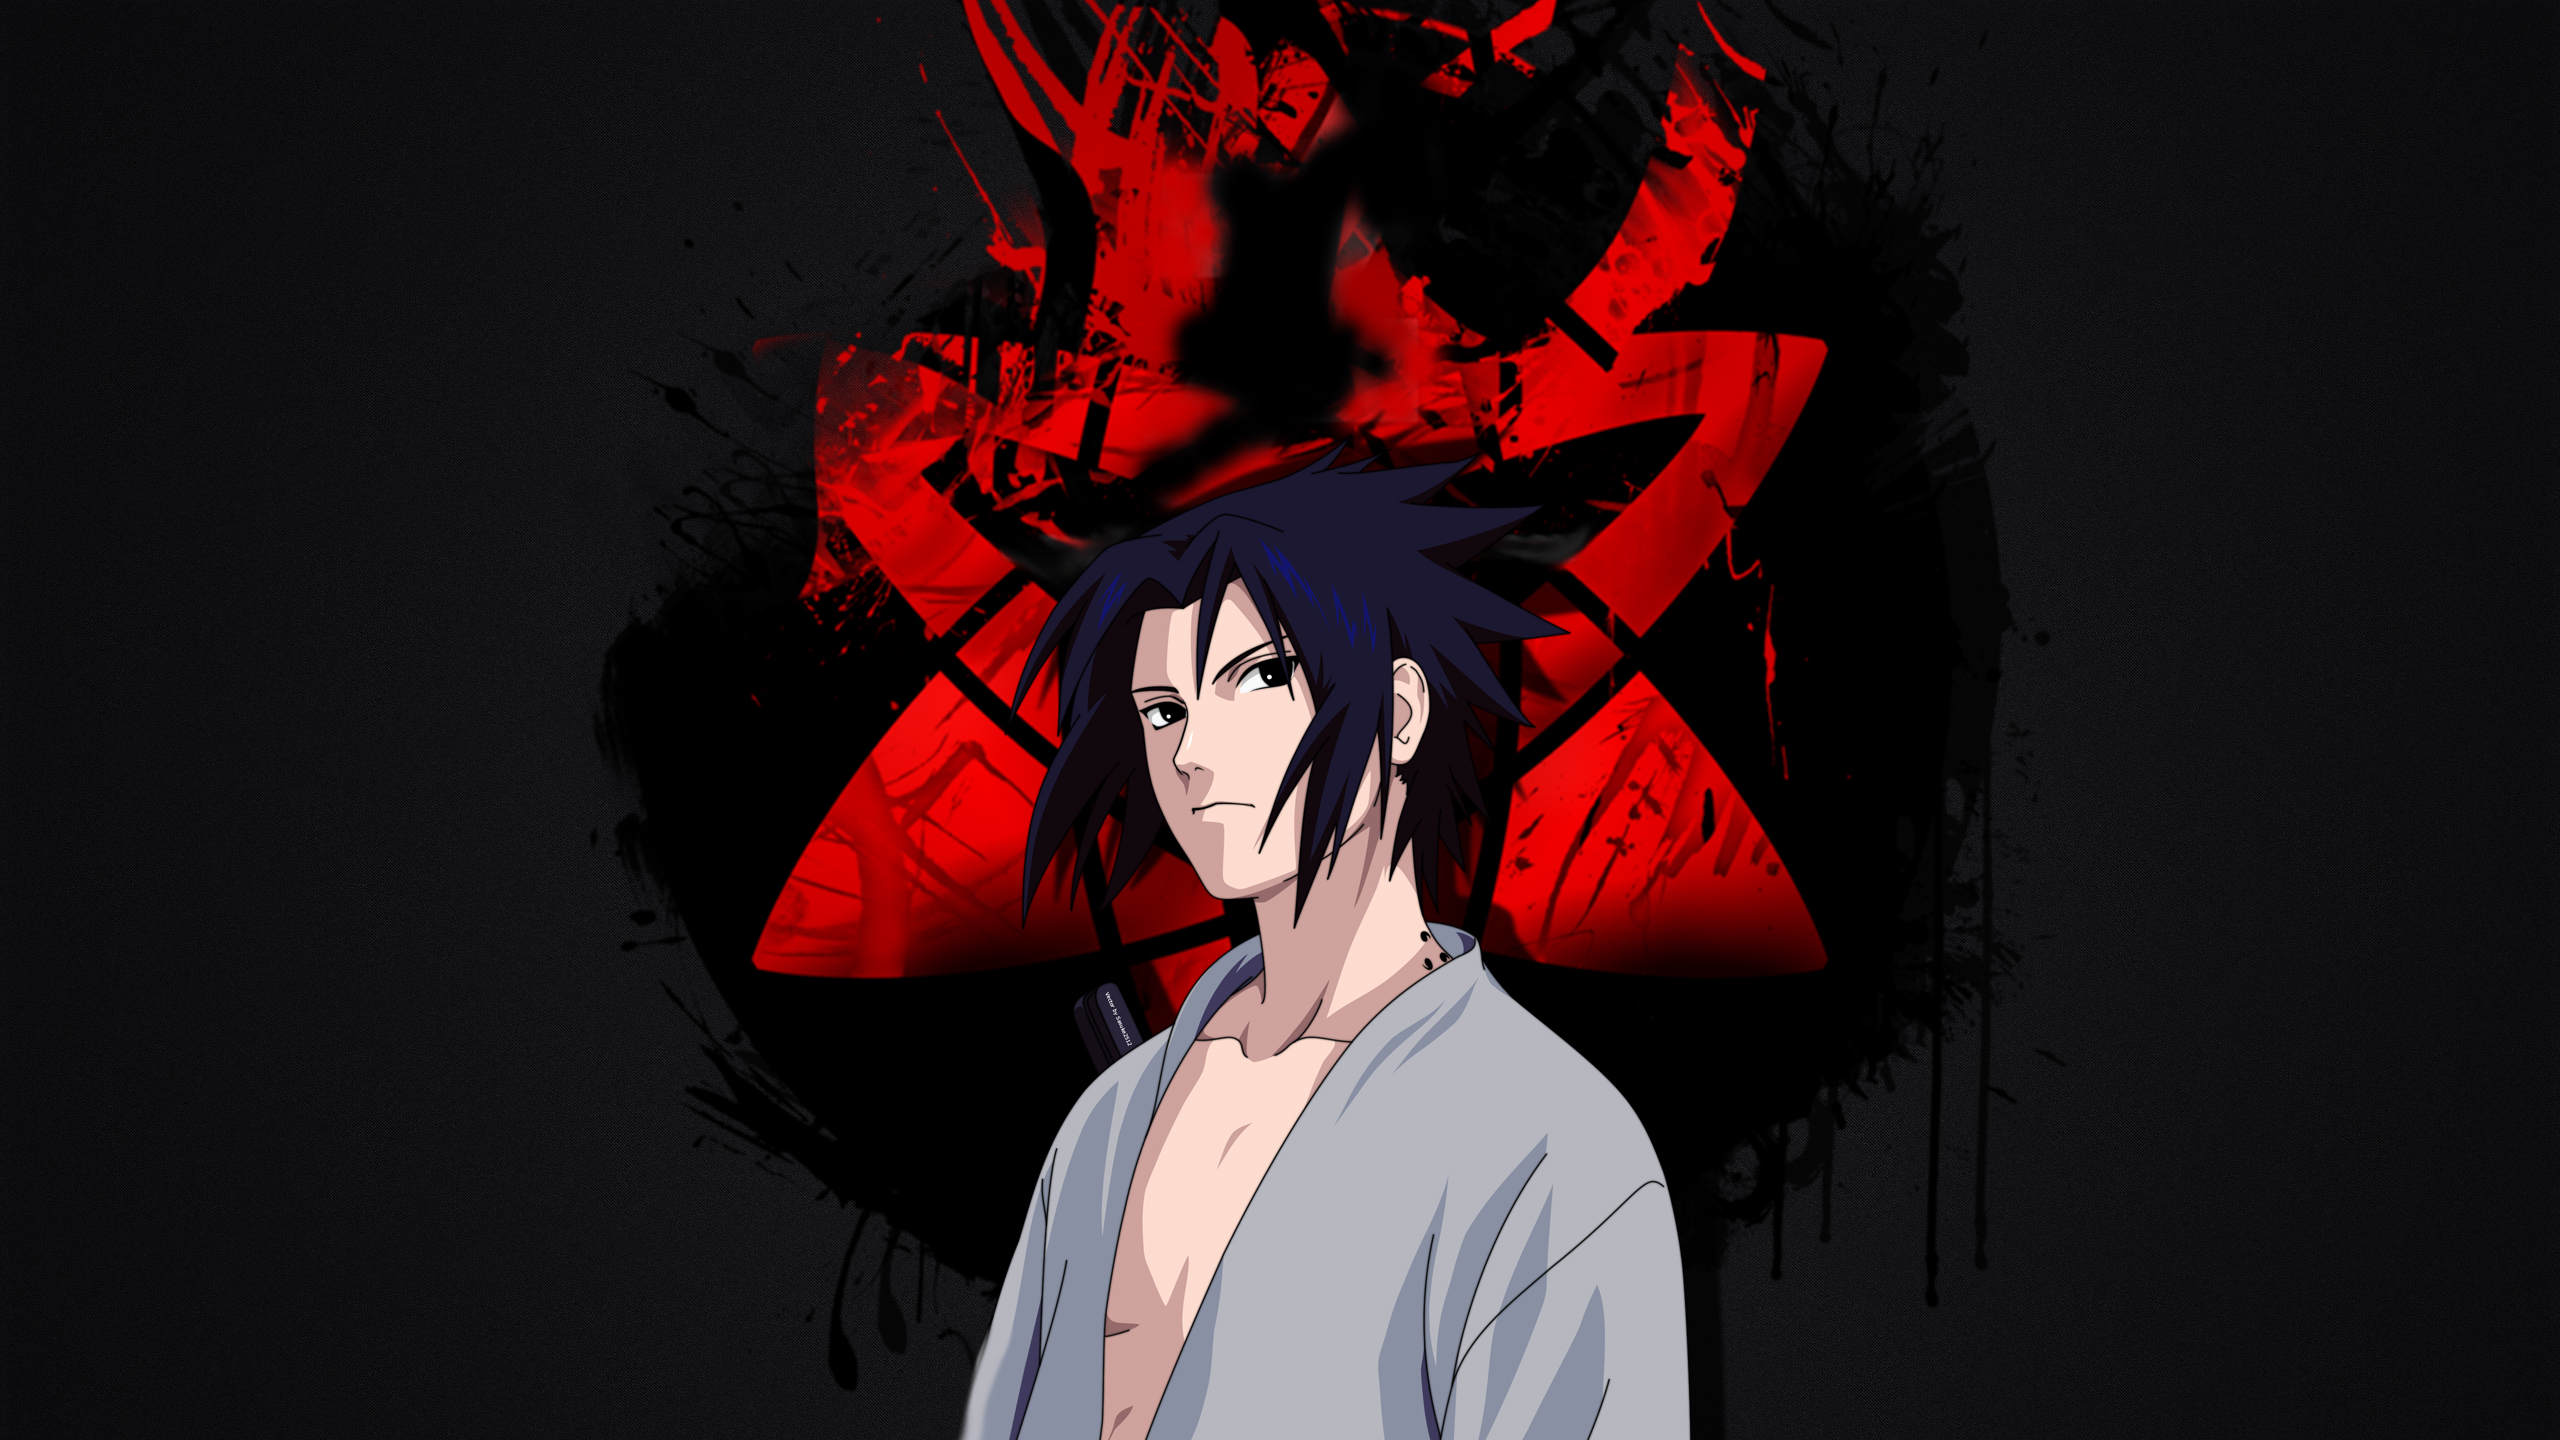 2560x1440 Sasuke Uchiha 1440p Resolution Wallpaper Hd Anime 4k Wallpapers Images Photos And Background